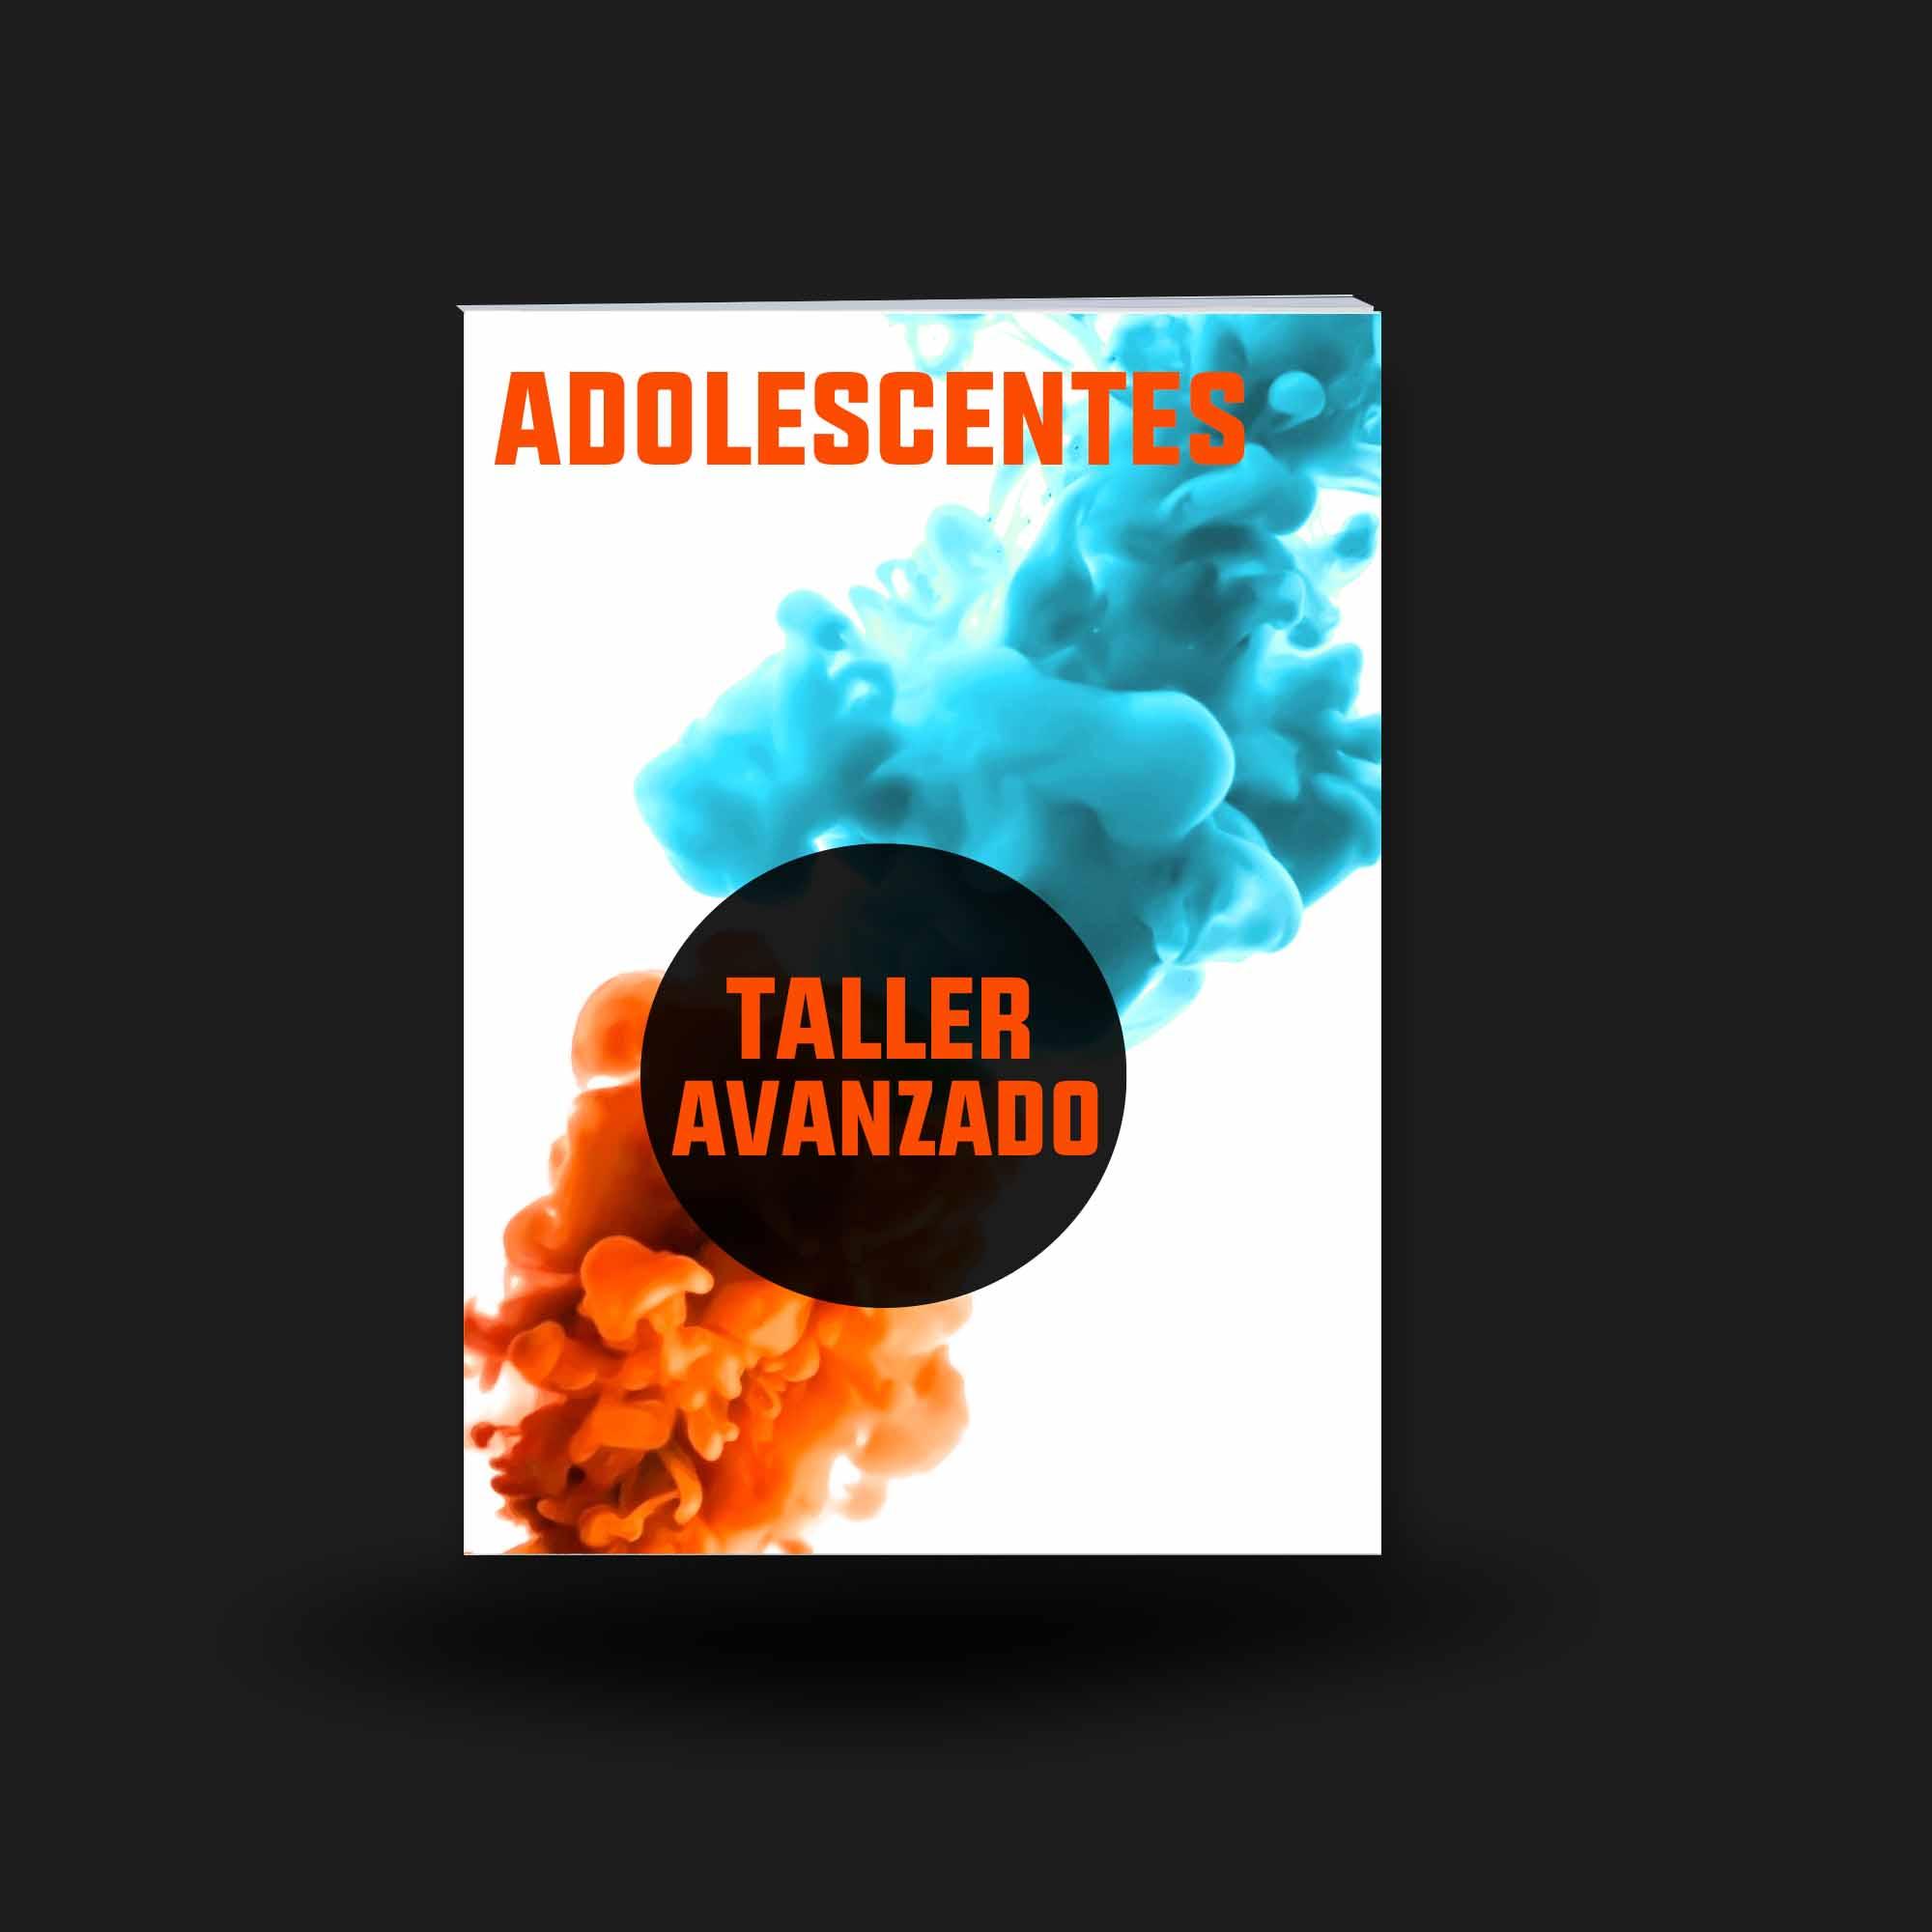 Adolescentes Taller Avanzado